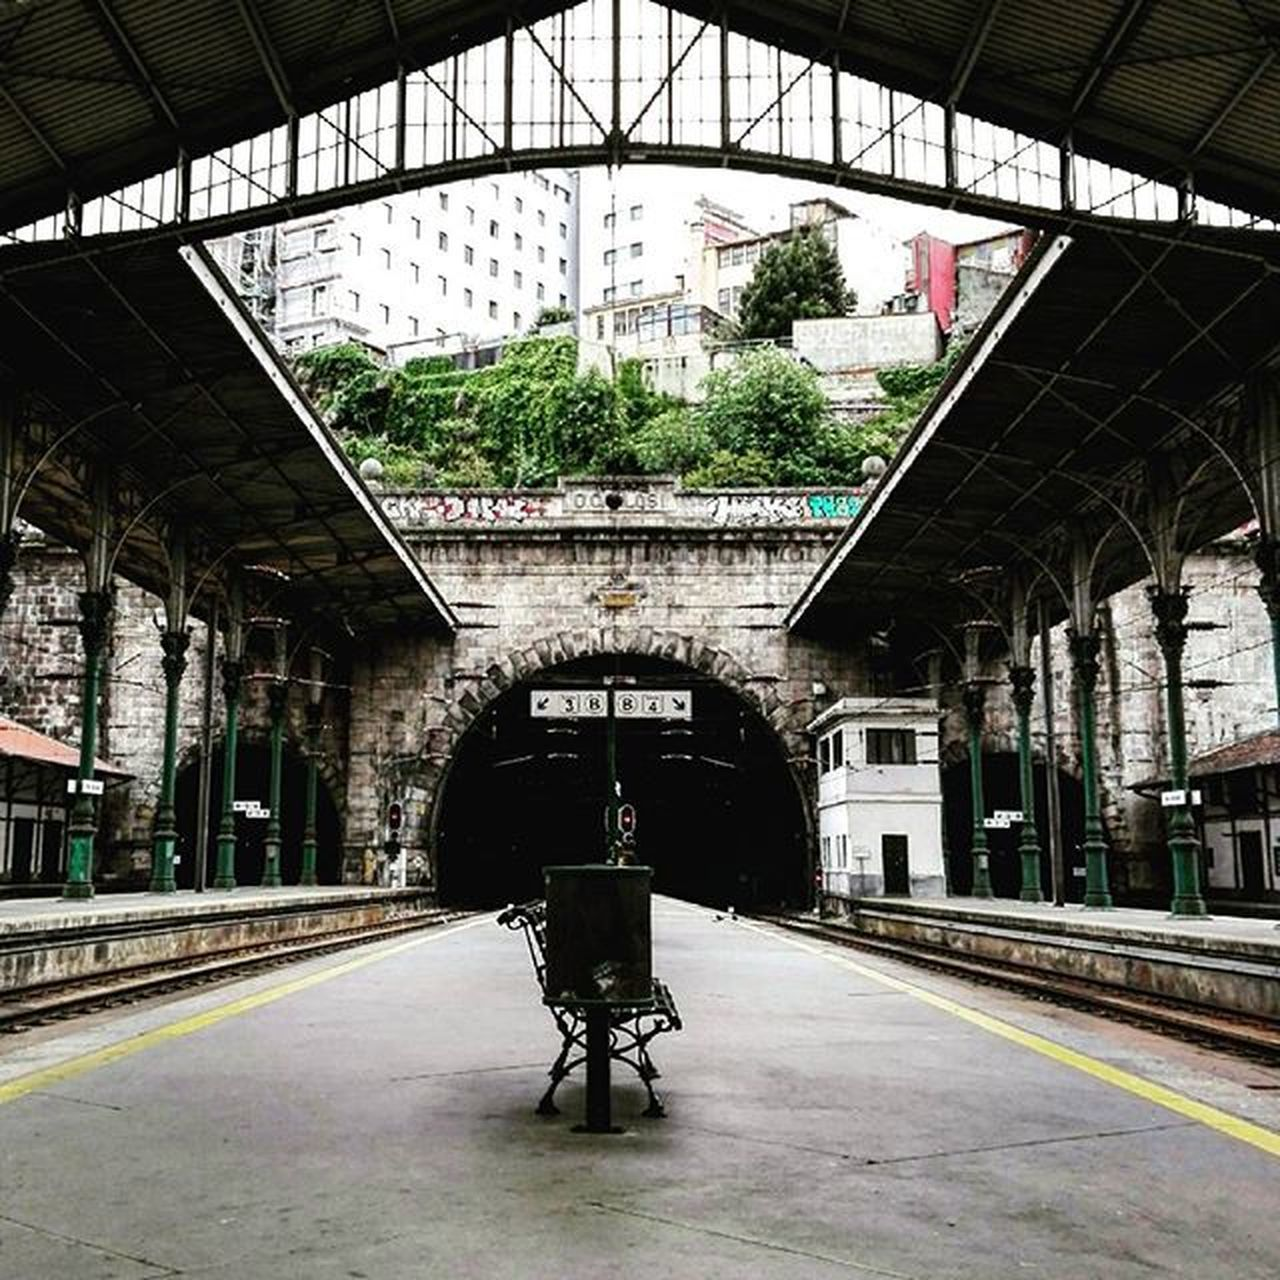 Sbento Station Oporto Street Portugal Underground Train Railstation Rails